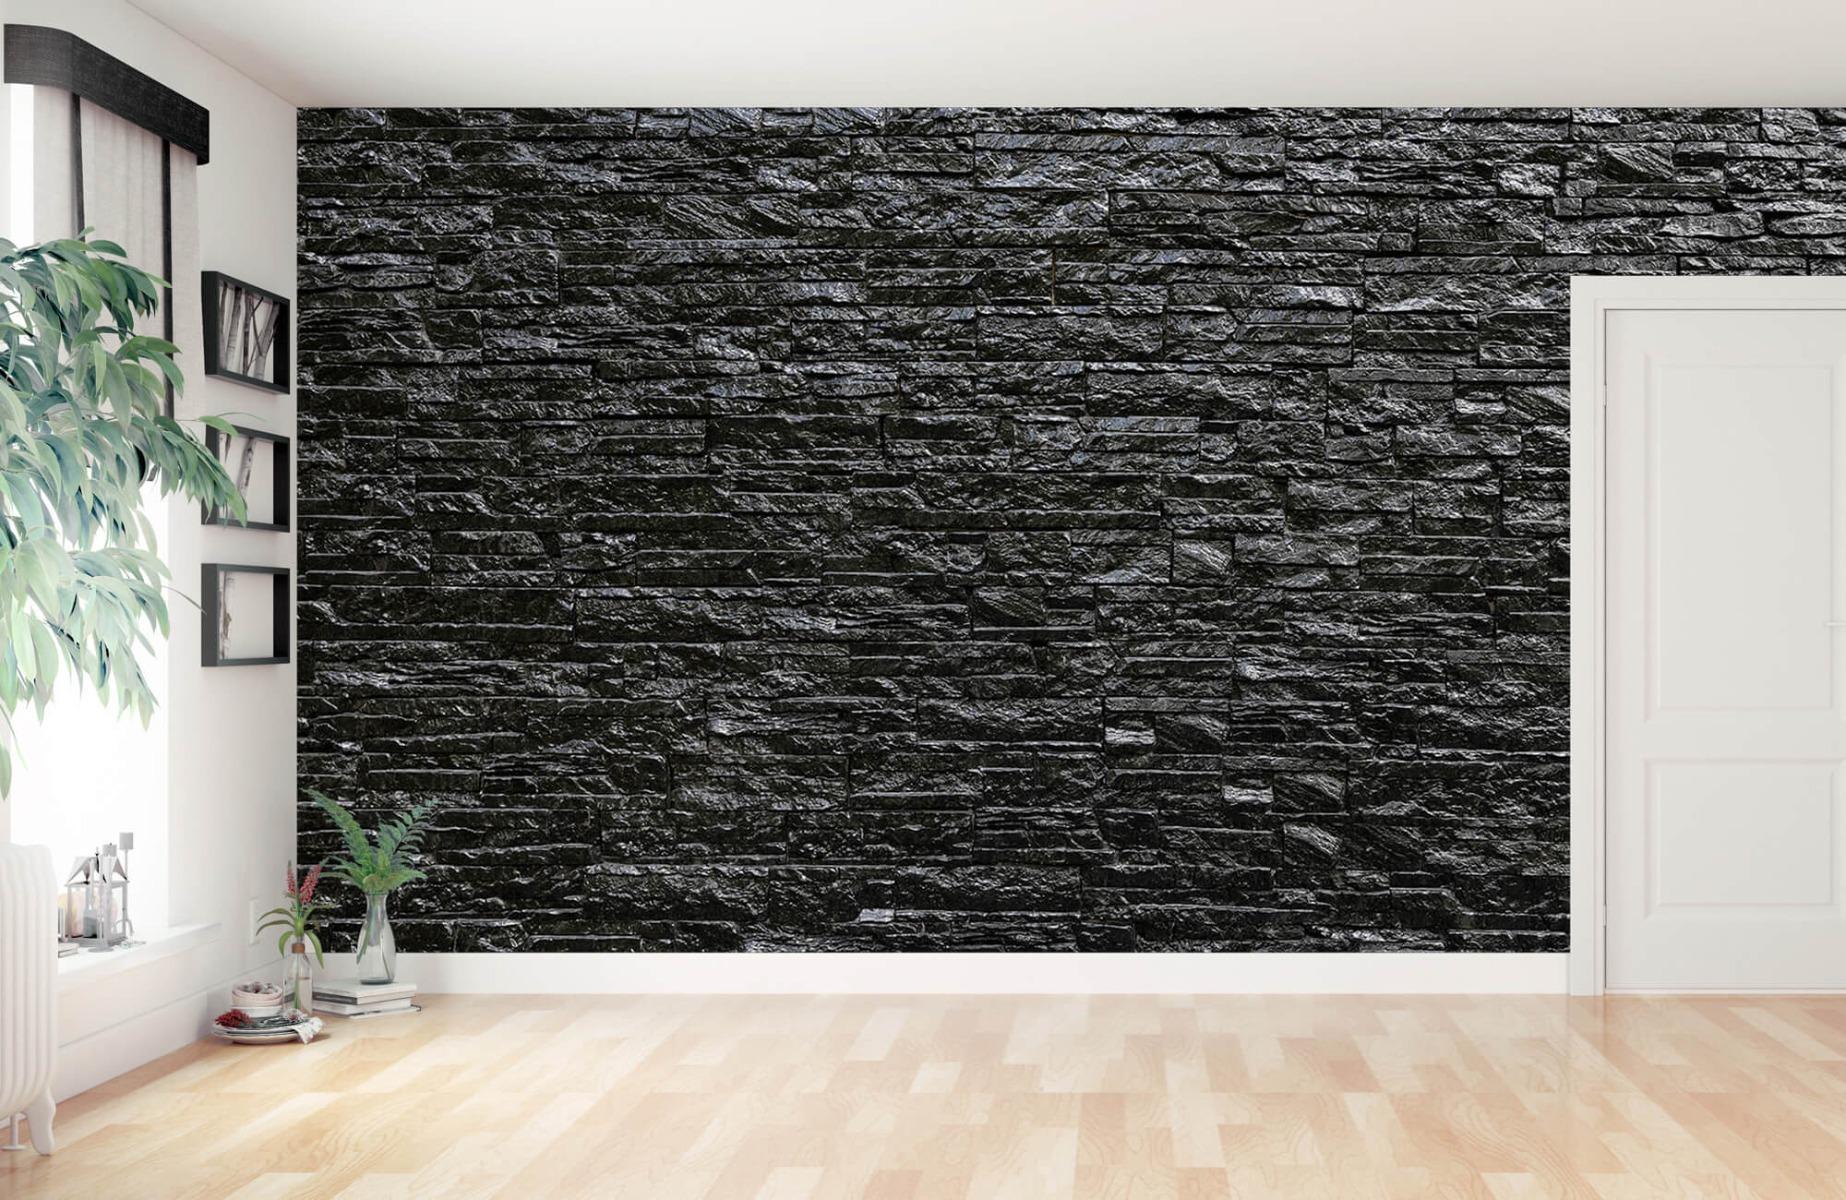 Steen behang - Zwarte stenen - Slaapkamer 11